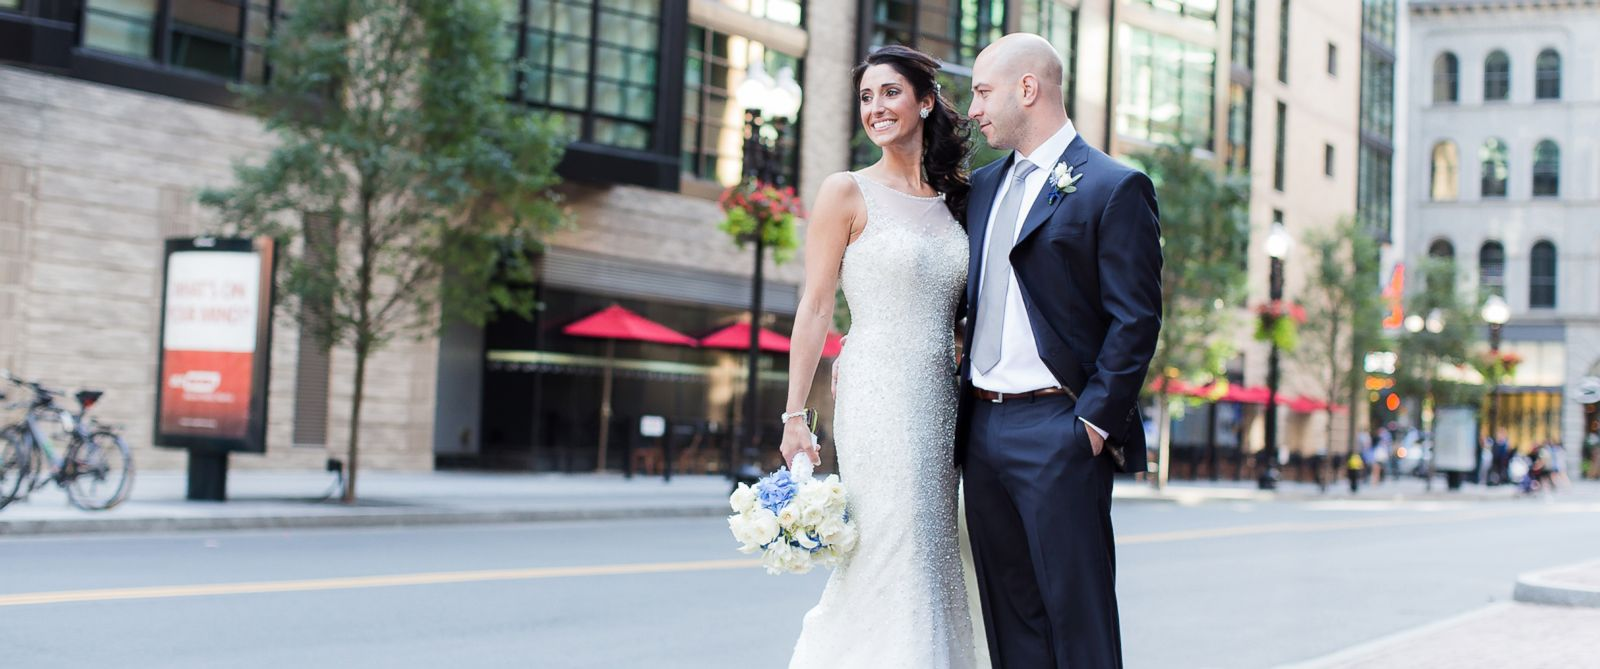 PHOTO: Boston Marathon bombing survivor James Costello and nurse Krista DAgostino were married Sat., Aug. 23, in Boston.